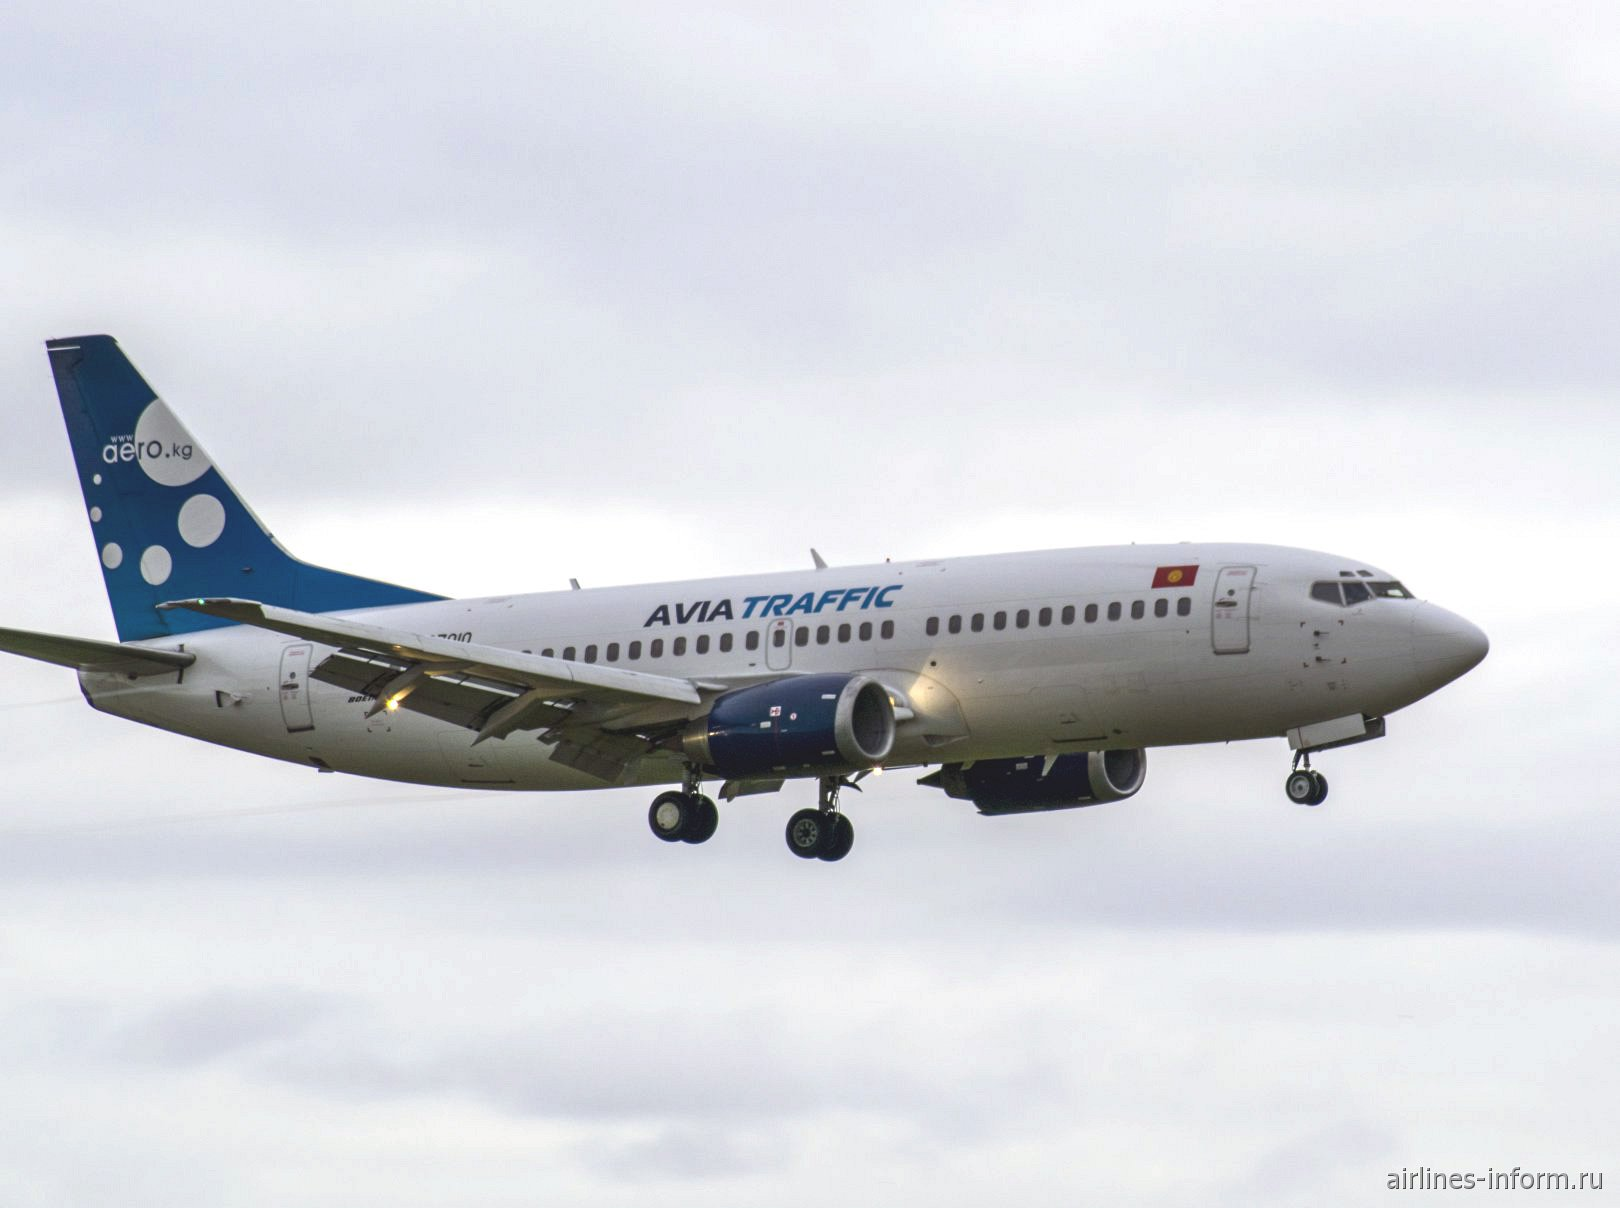 Боинг-737-300 авиакомпании Avia Traffic Company садится в аэропорту Домодедово